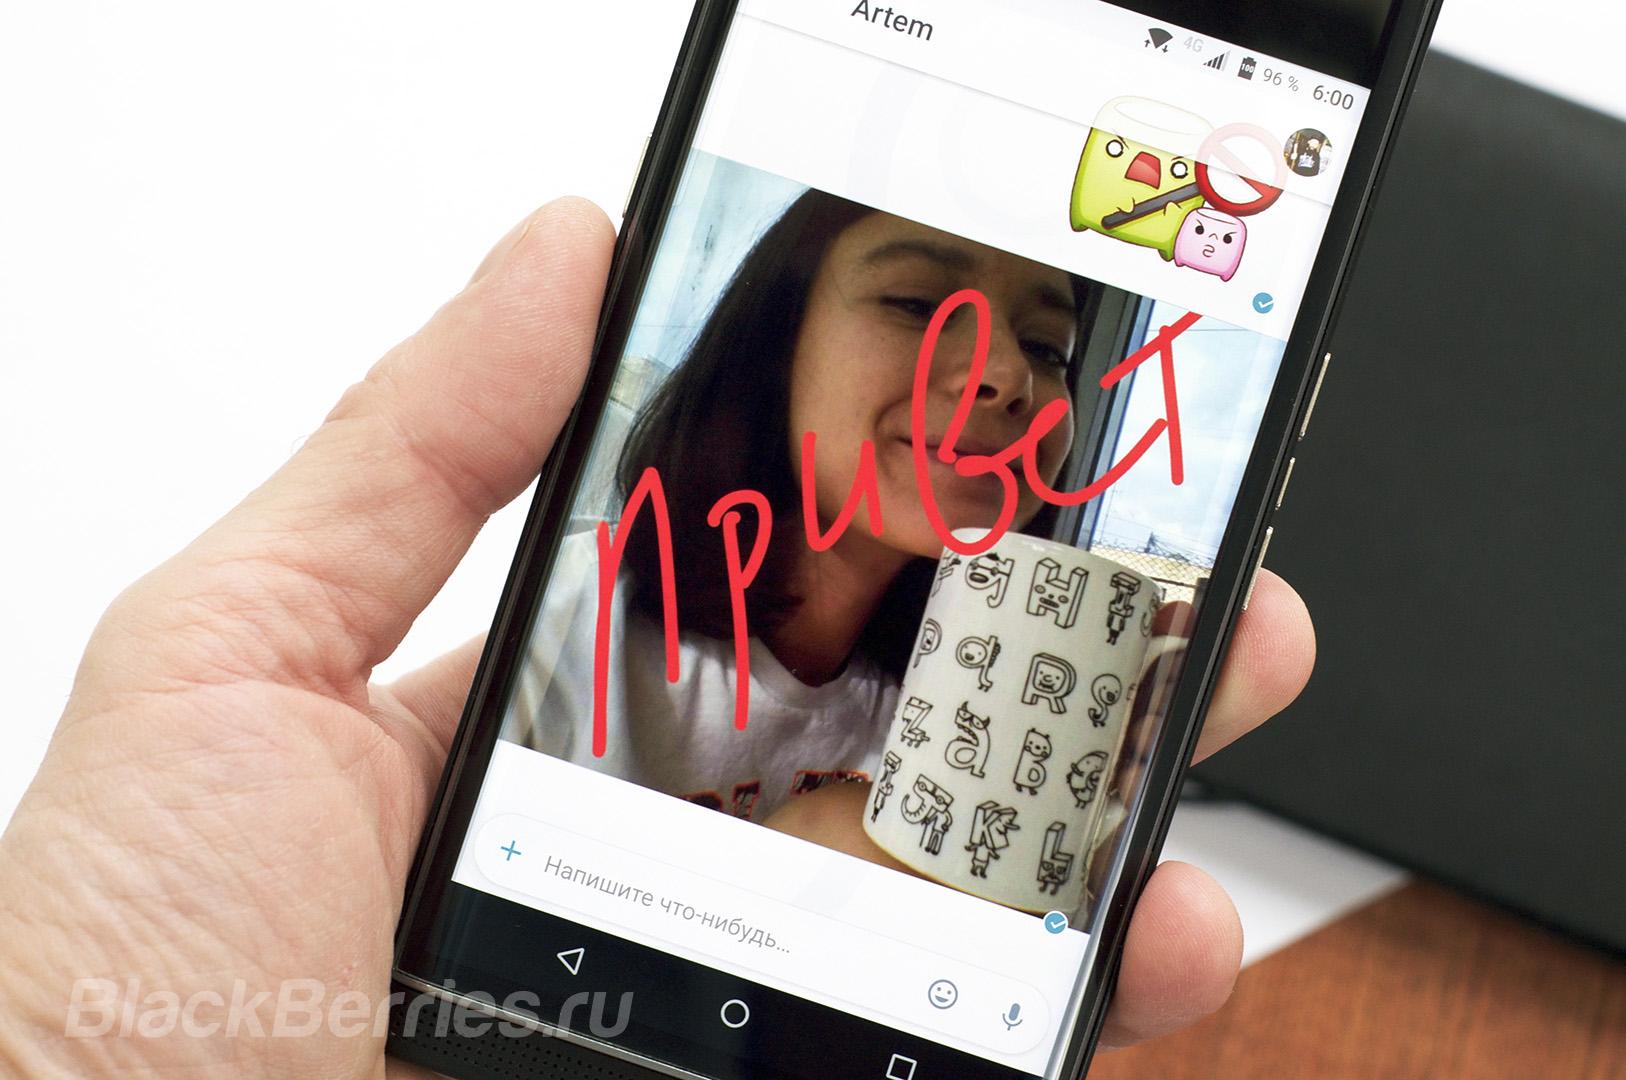 blackberry-priv-apps-25-10